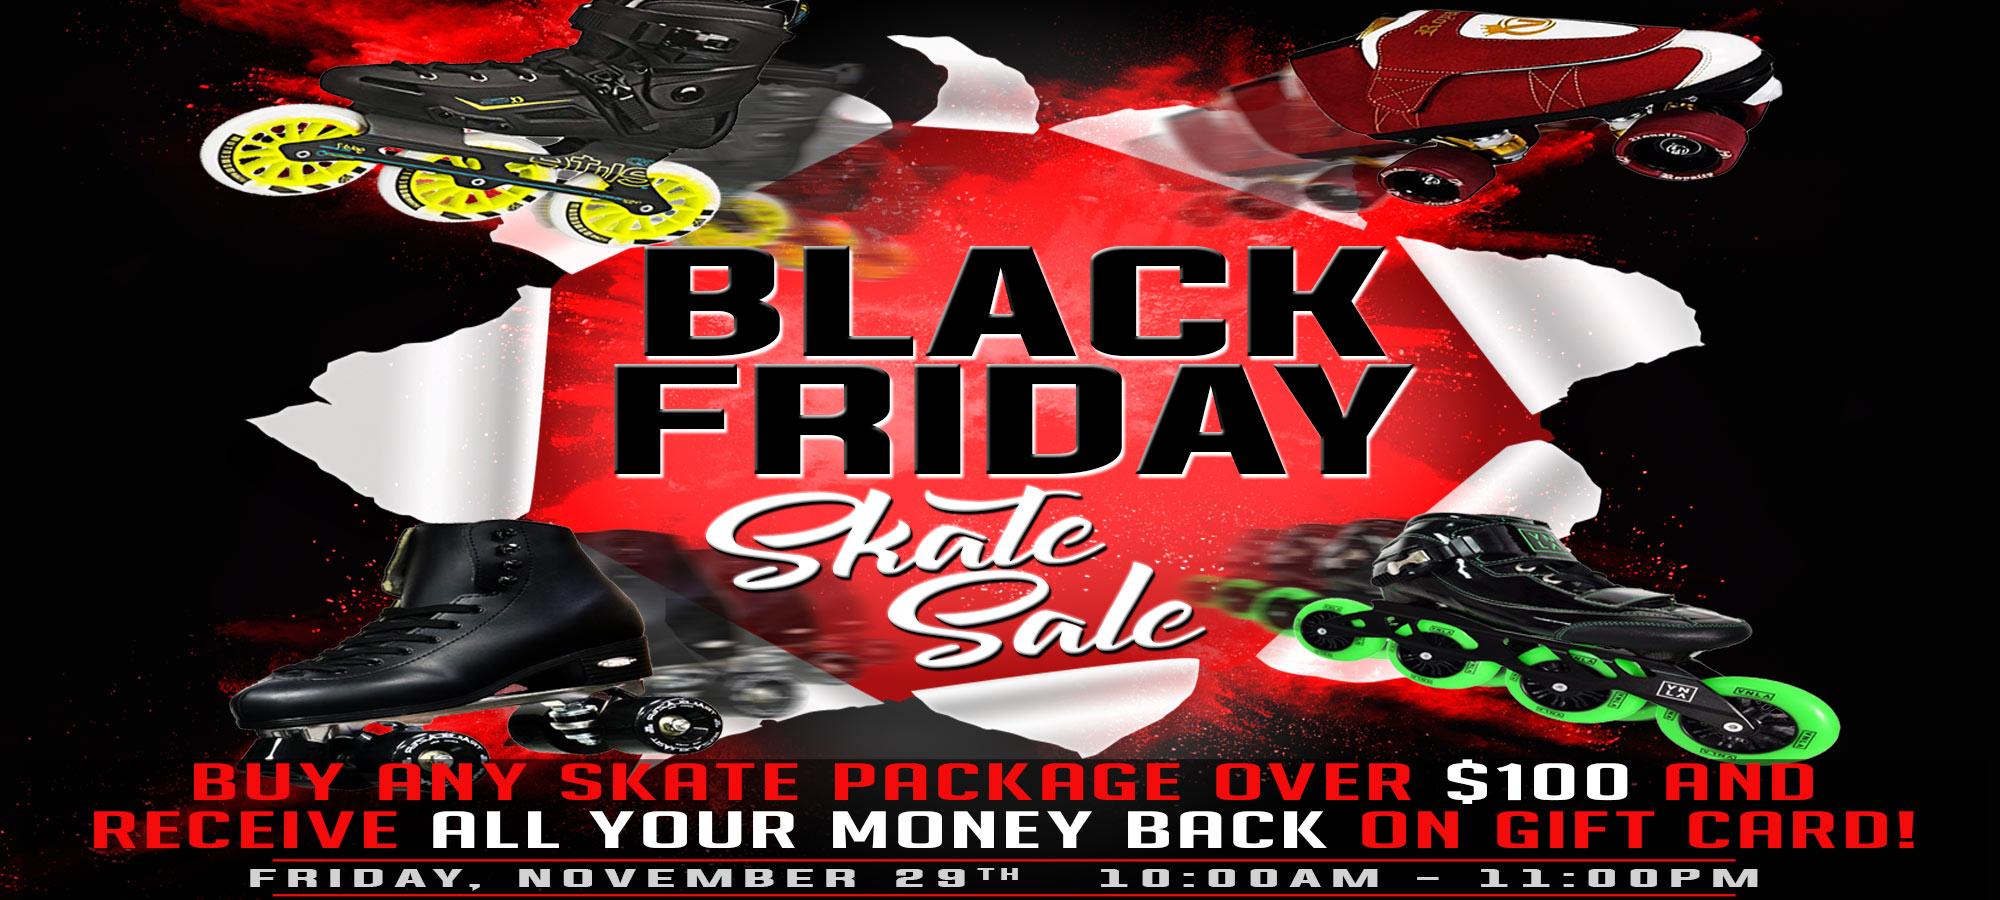 Black-Friday-Skate-Sale-2019